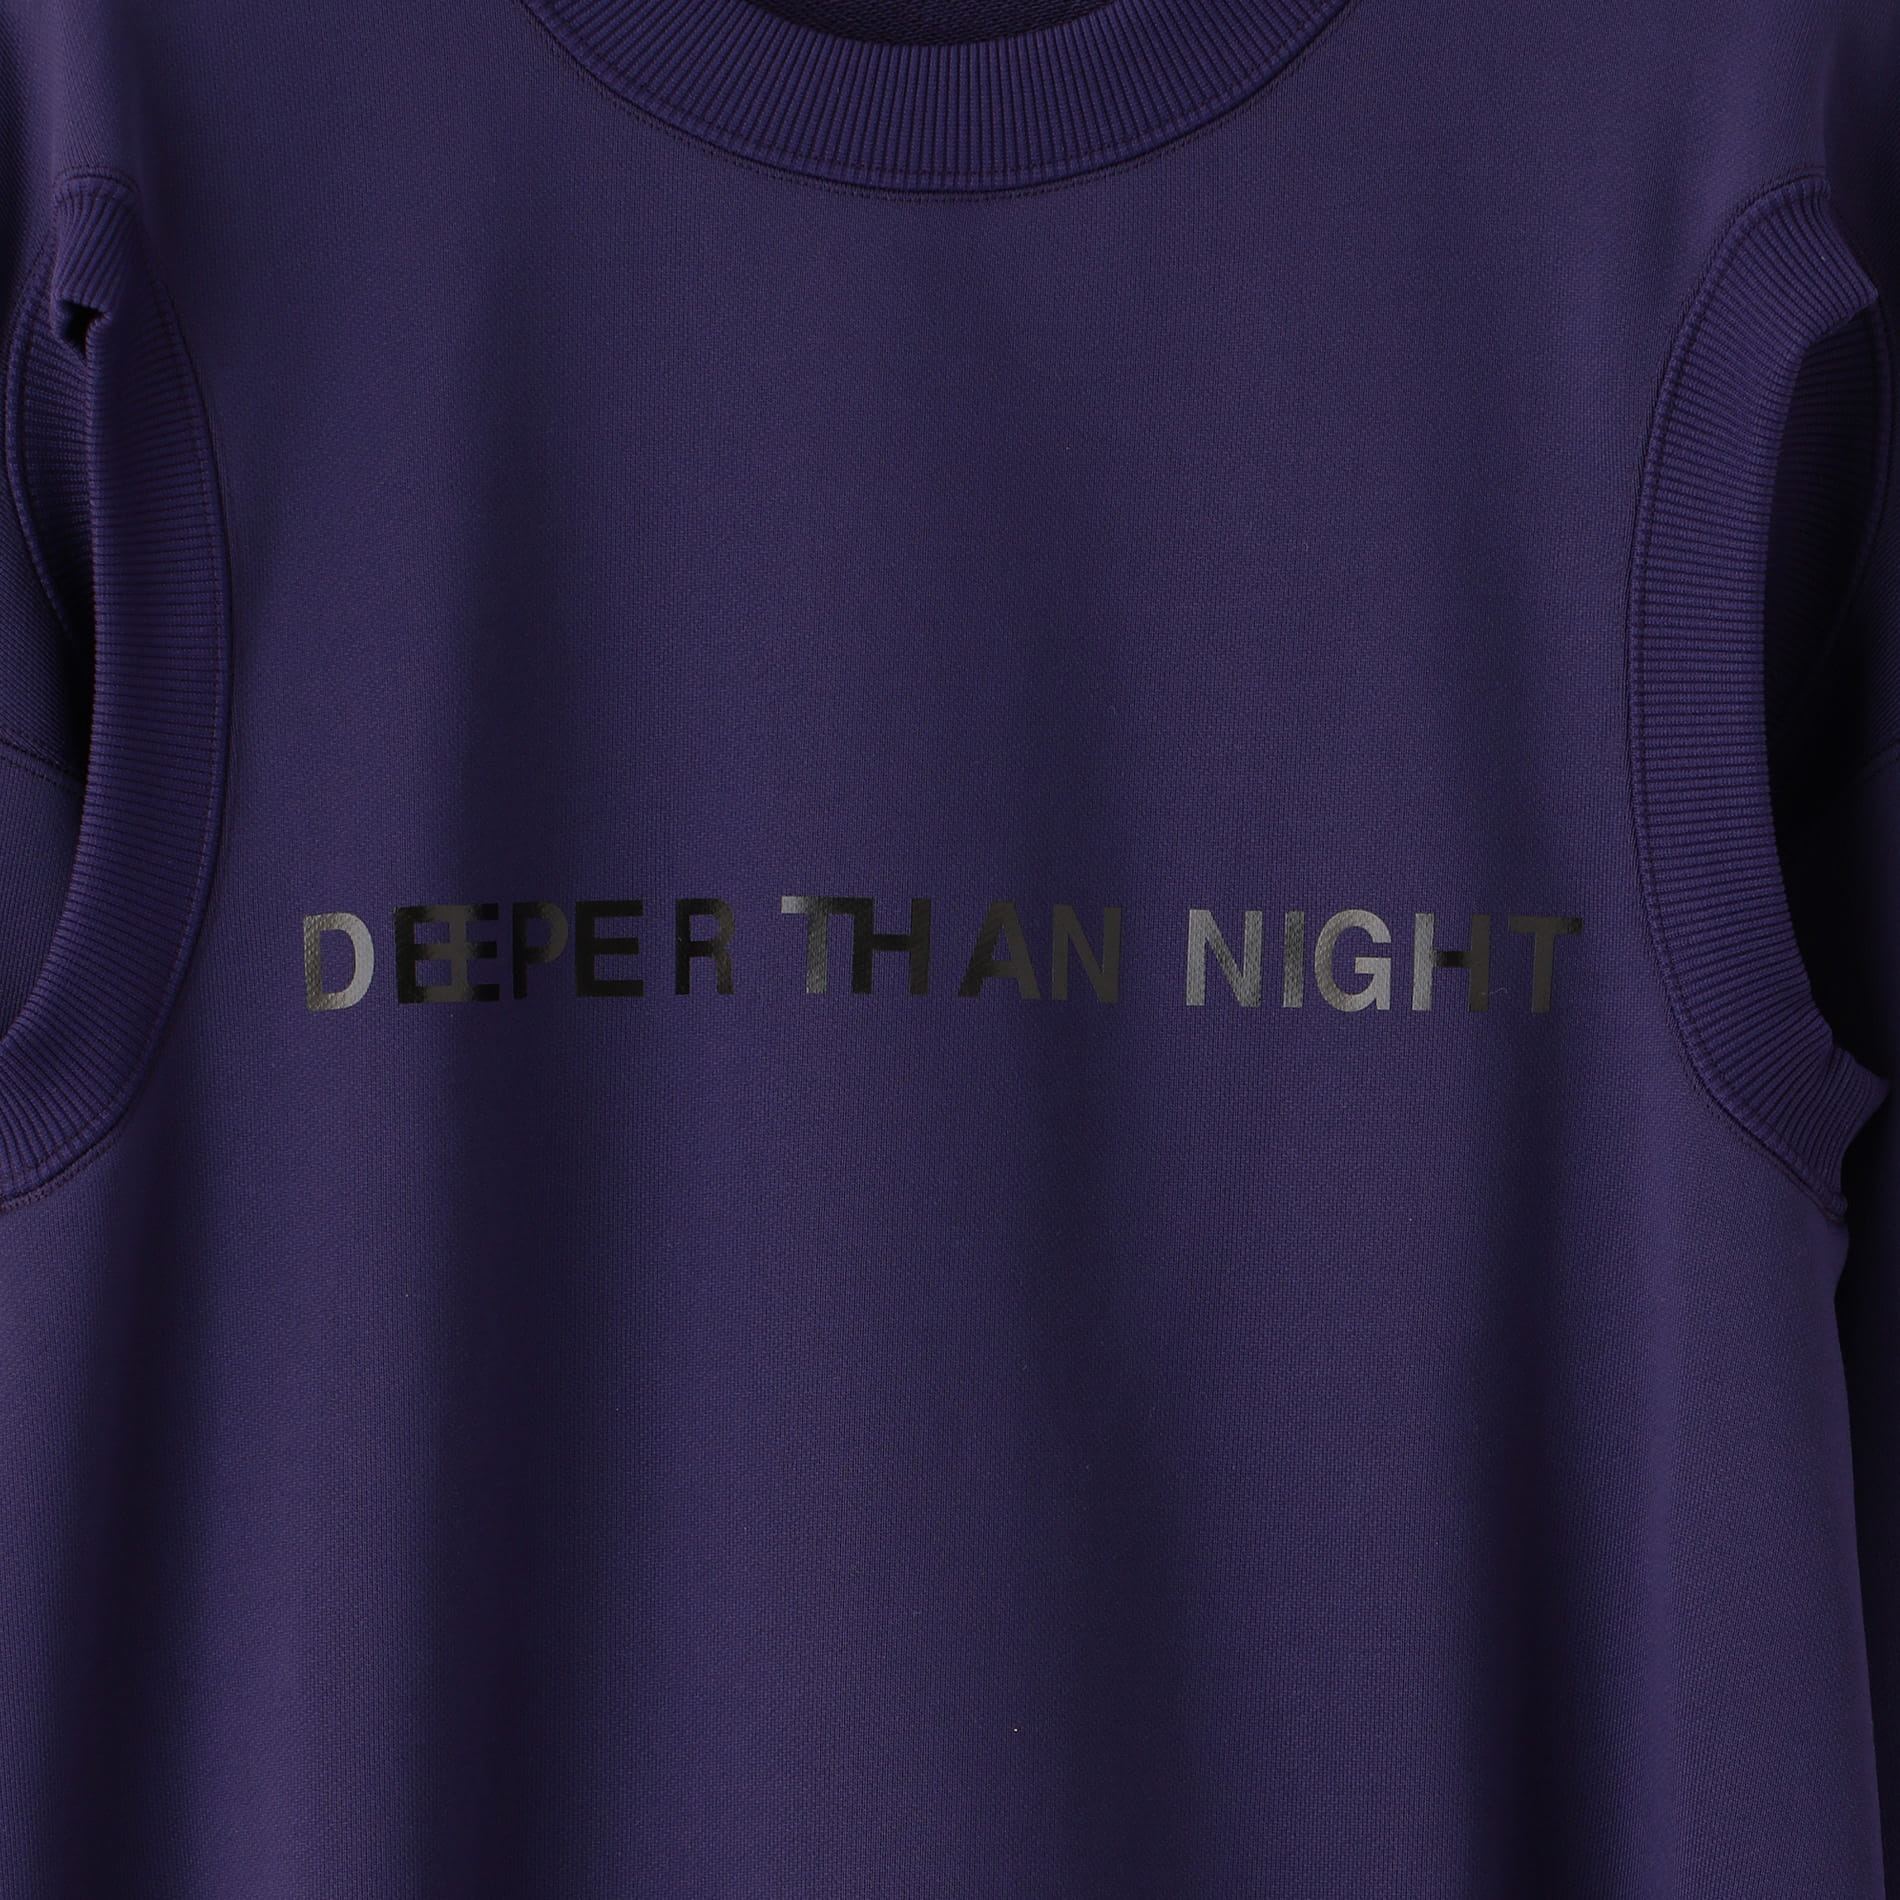 【JOHN LAWRENCE SULLIVAN】DEEPER THAN NIGHT ARM HOLE PULLOVER 5A004-0520-31